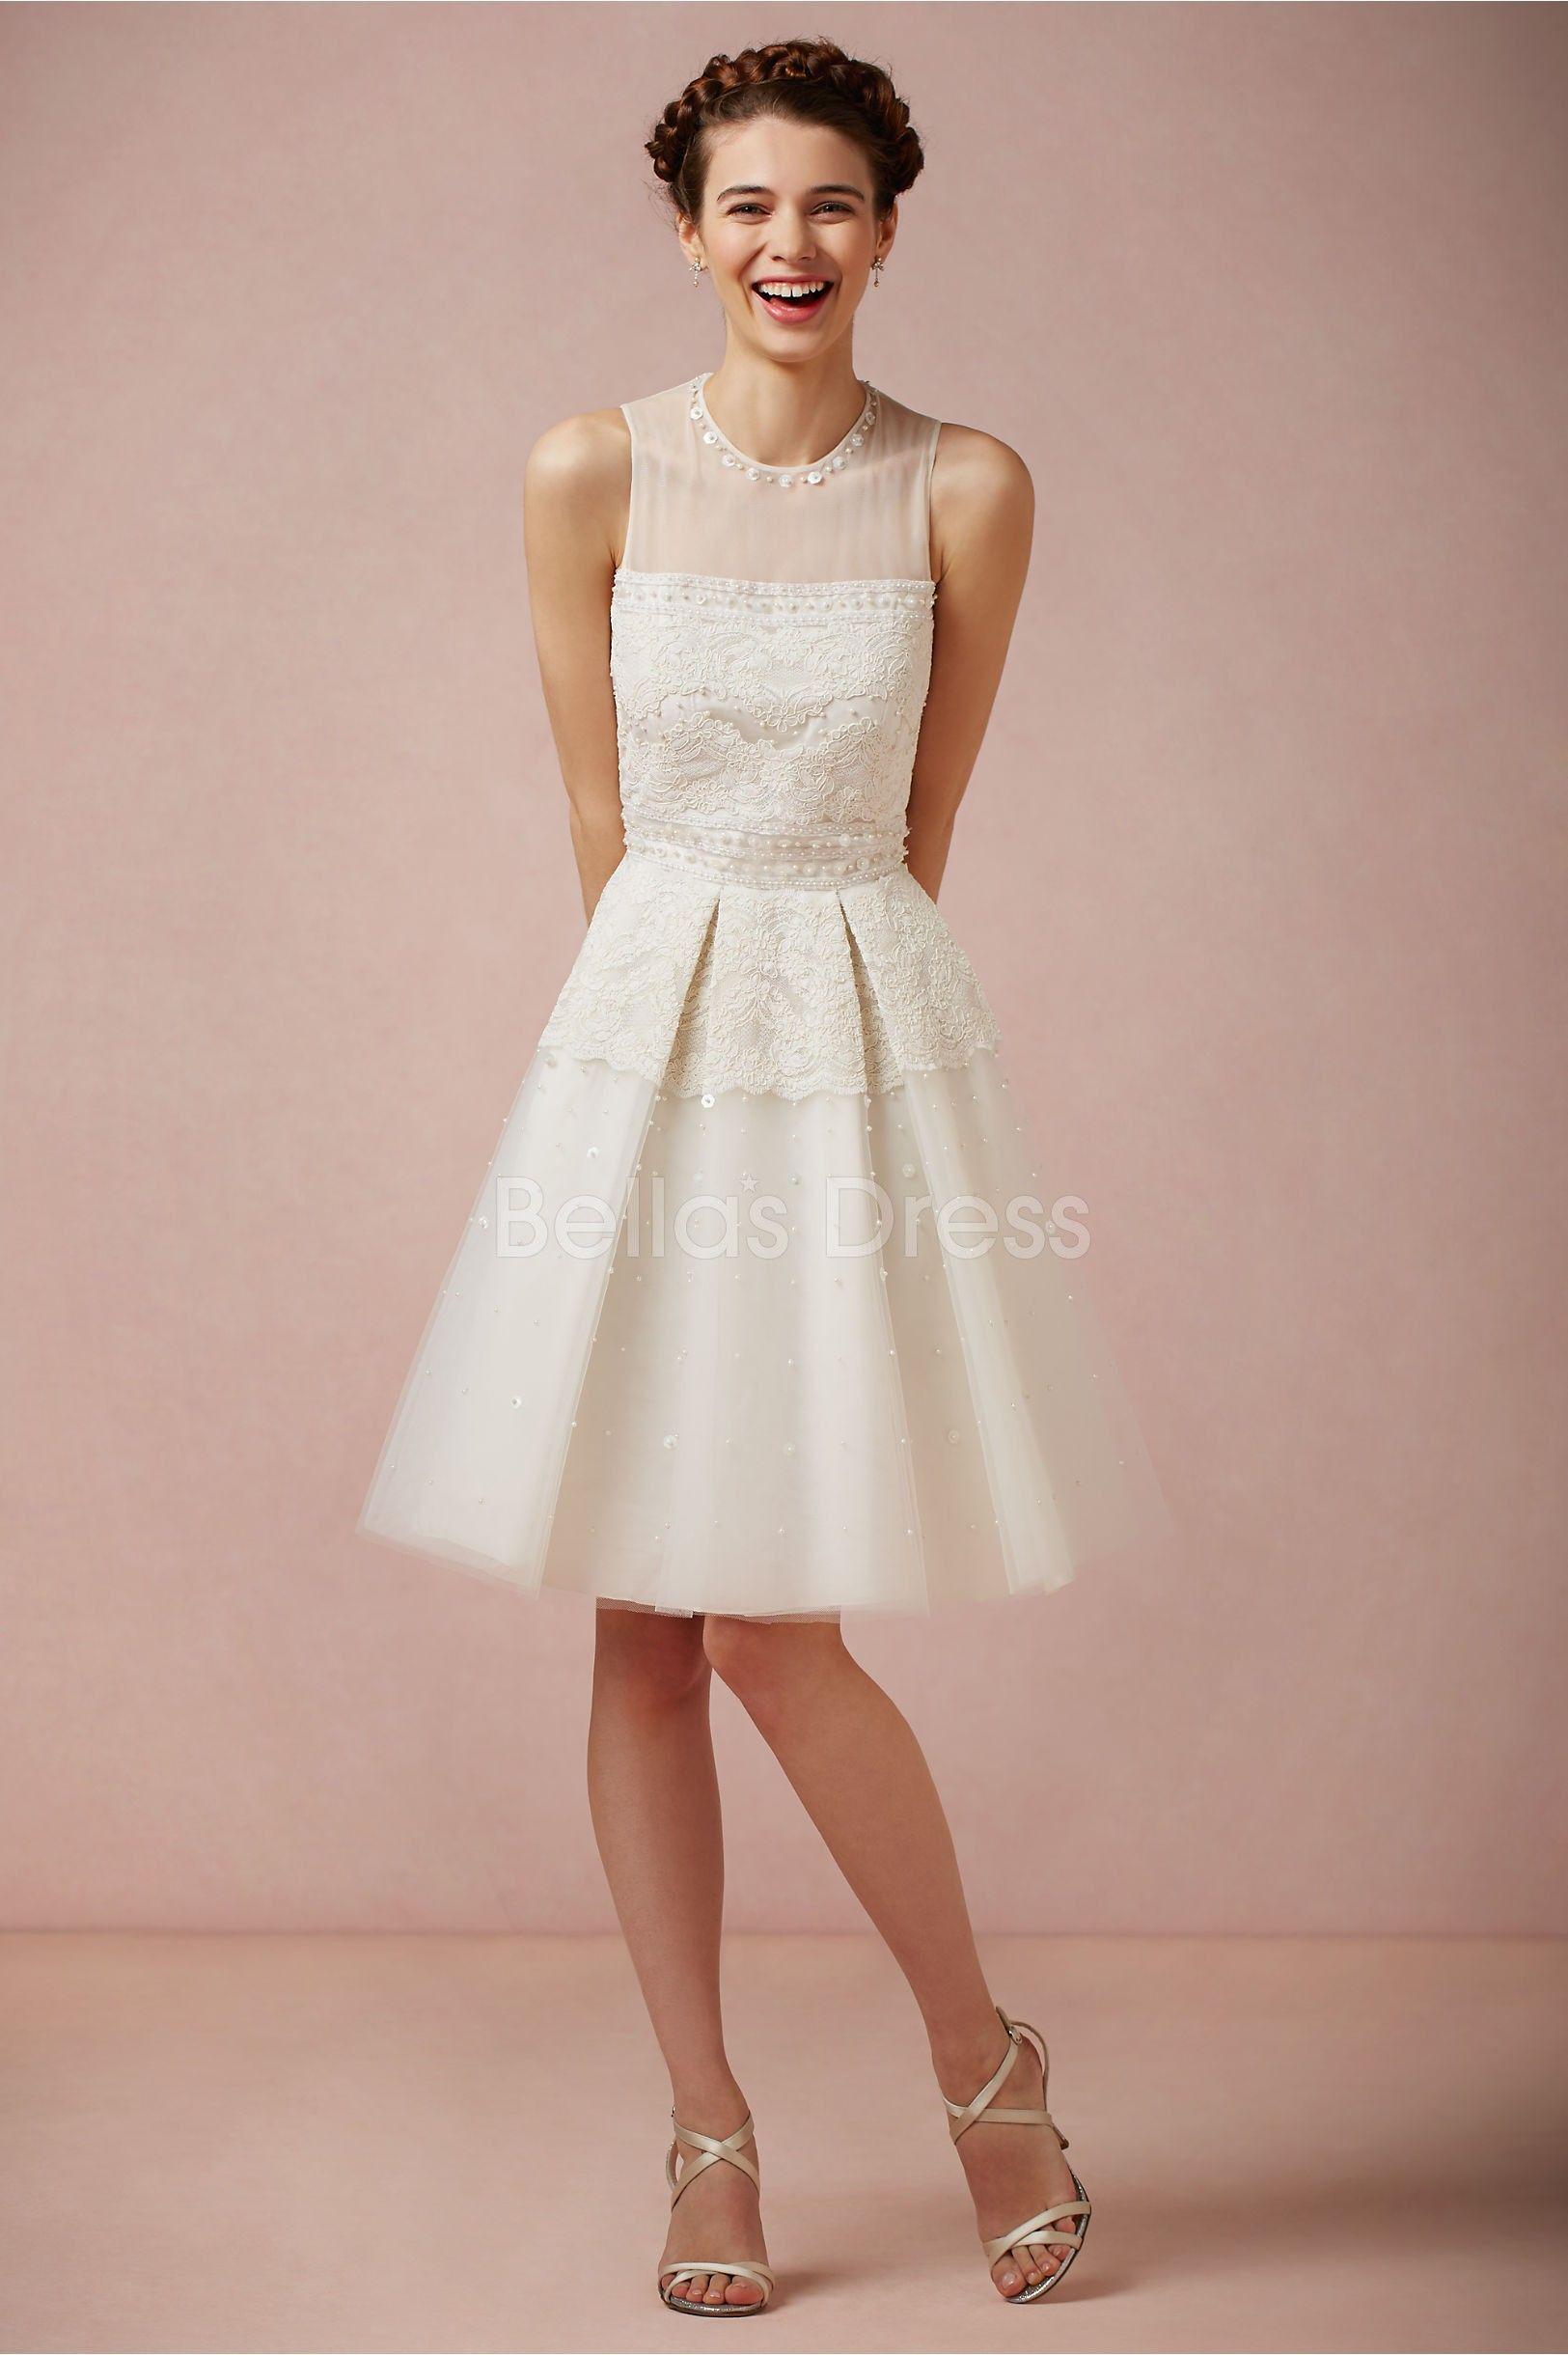 Bellas wedding dress  Erika Bingham erikacbingham on Pinterest